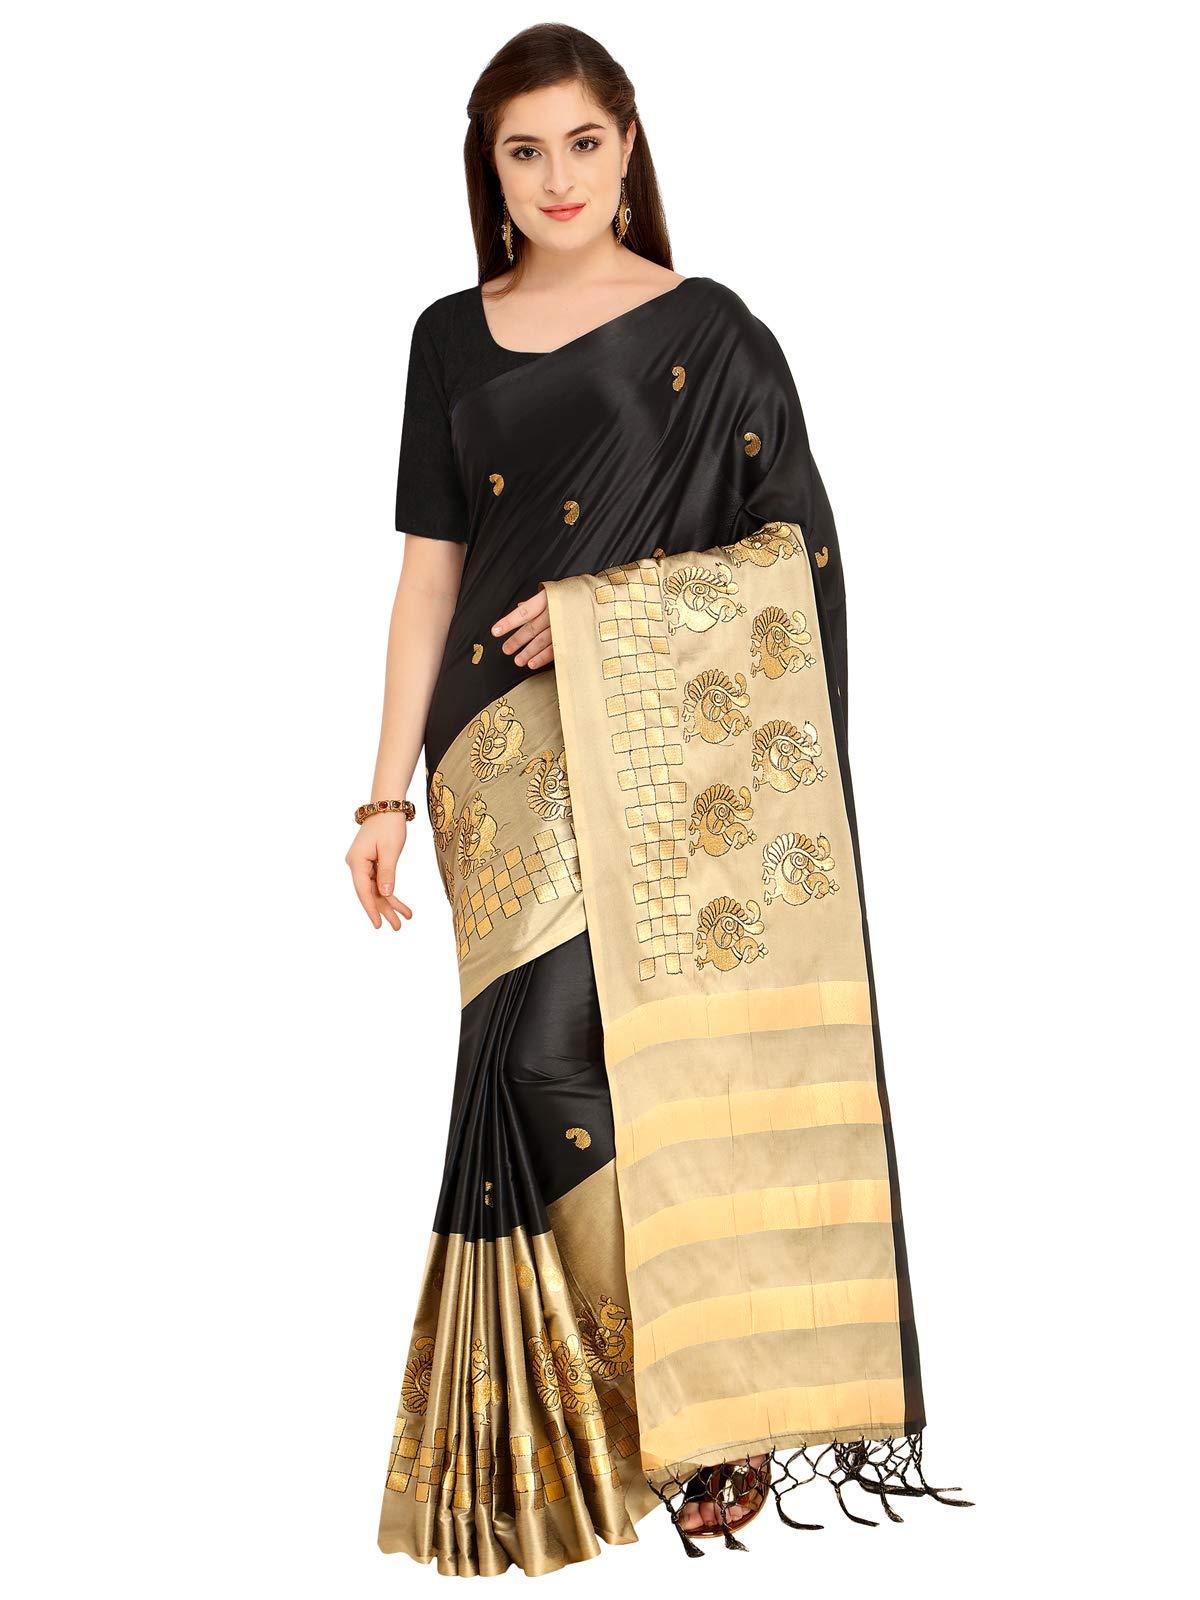 Kanchnar Women's Black and Beige Art Silk Embroidery Saree